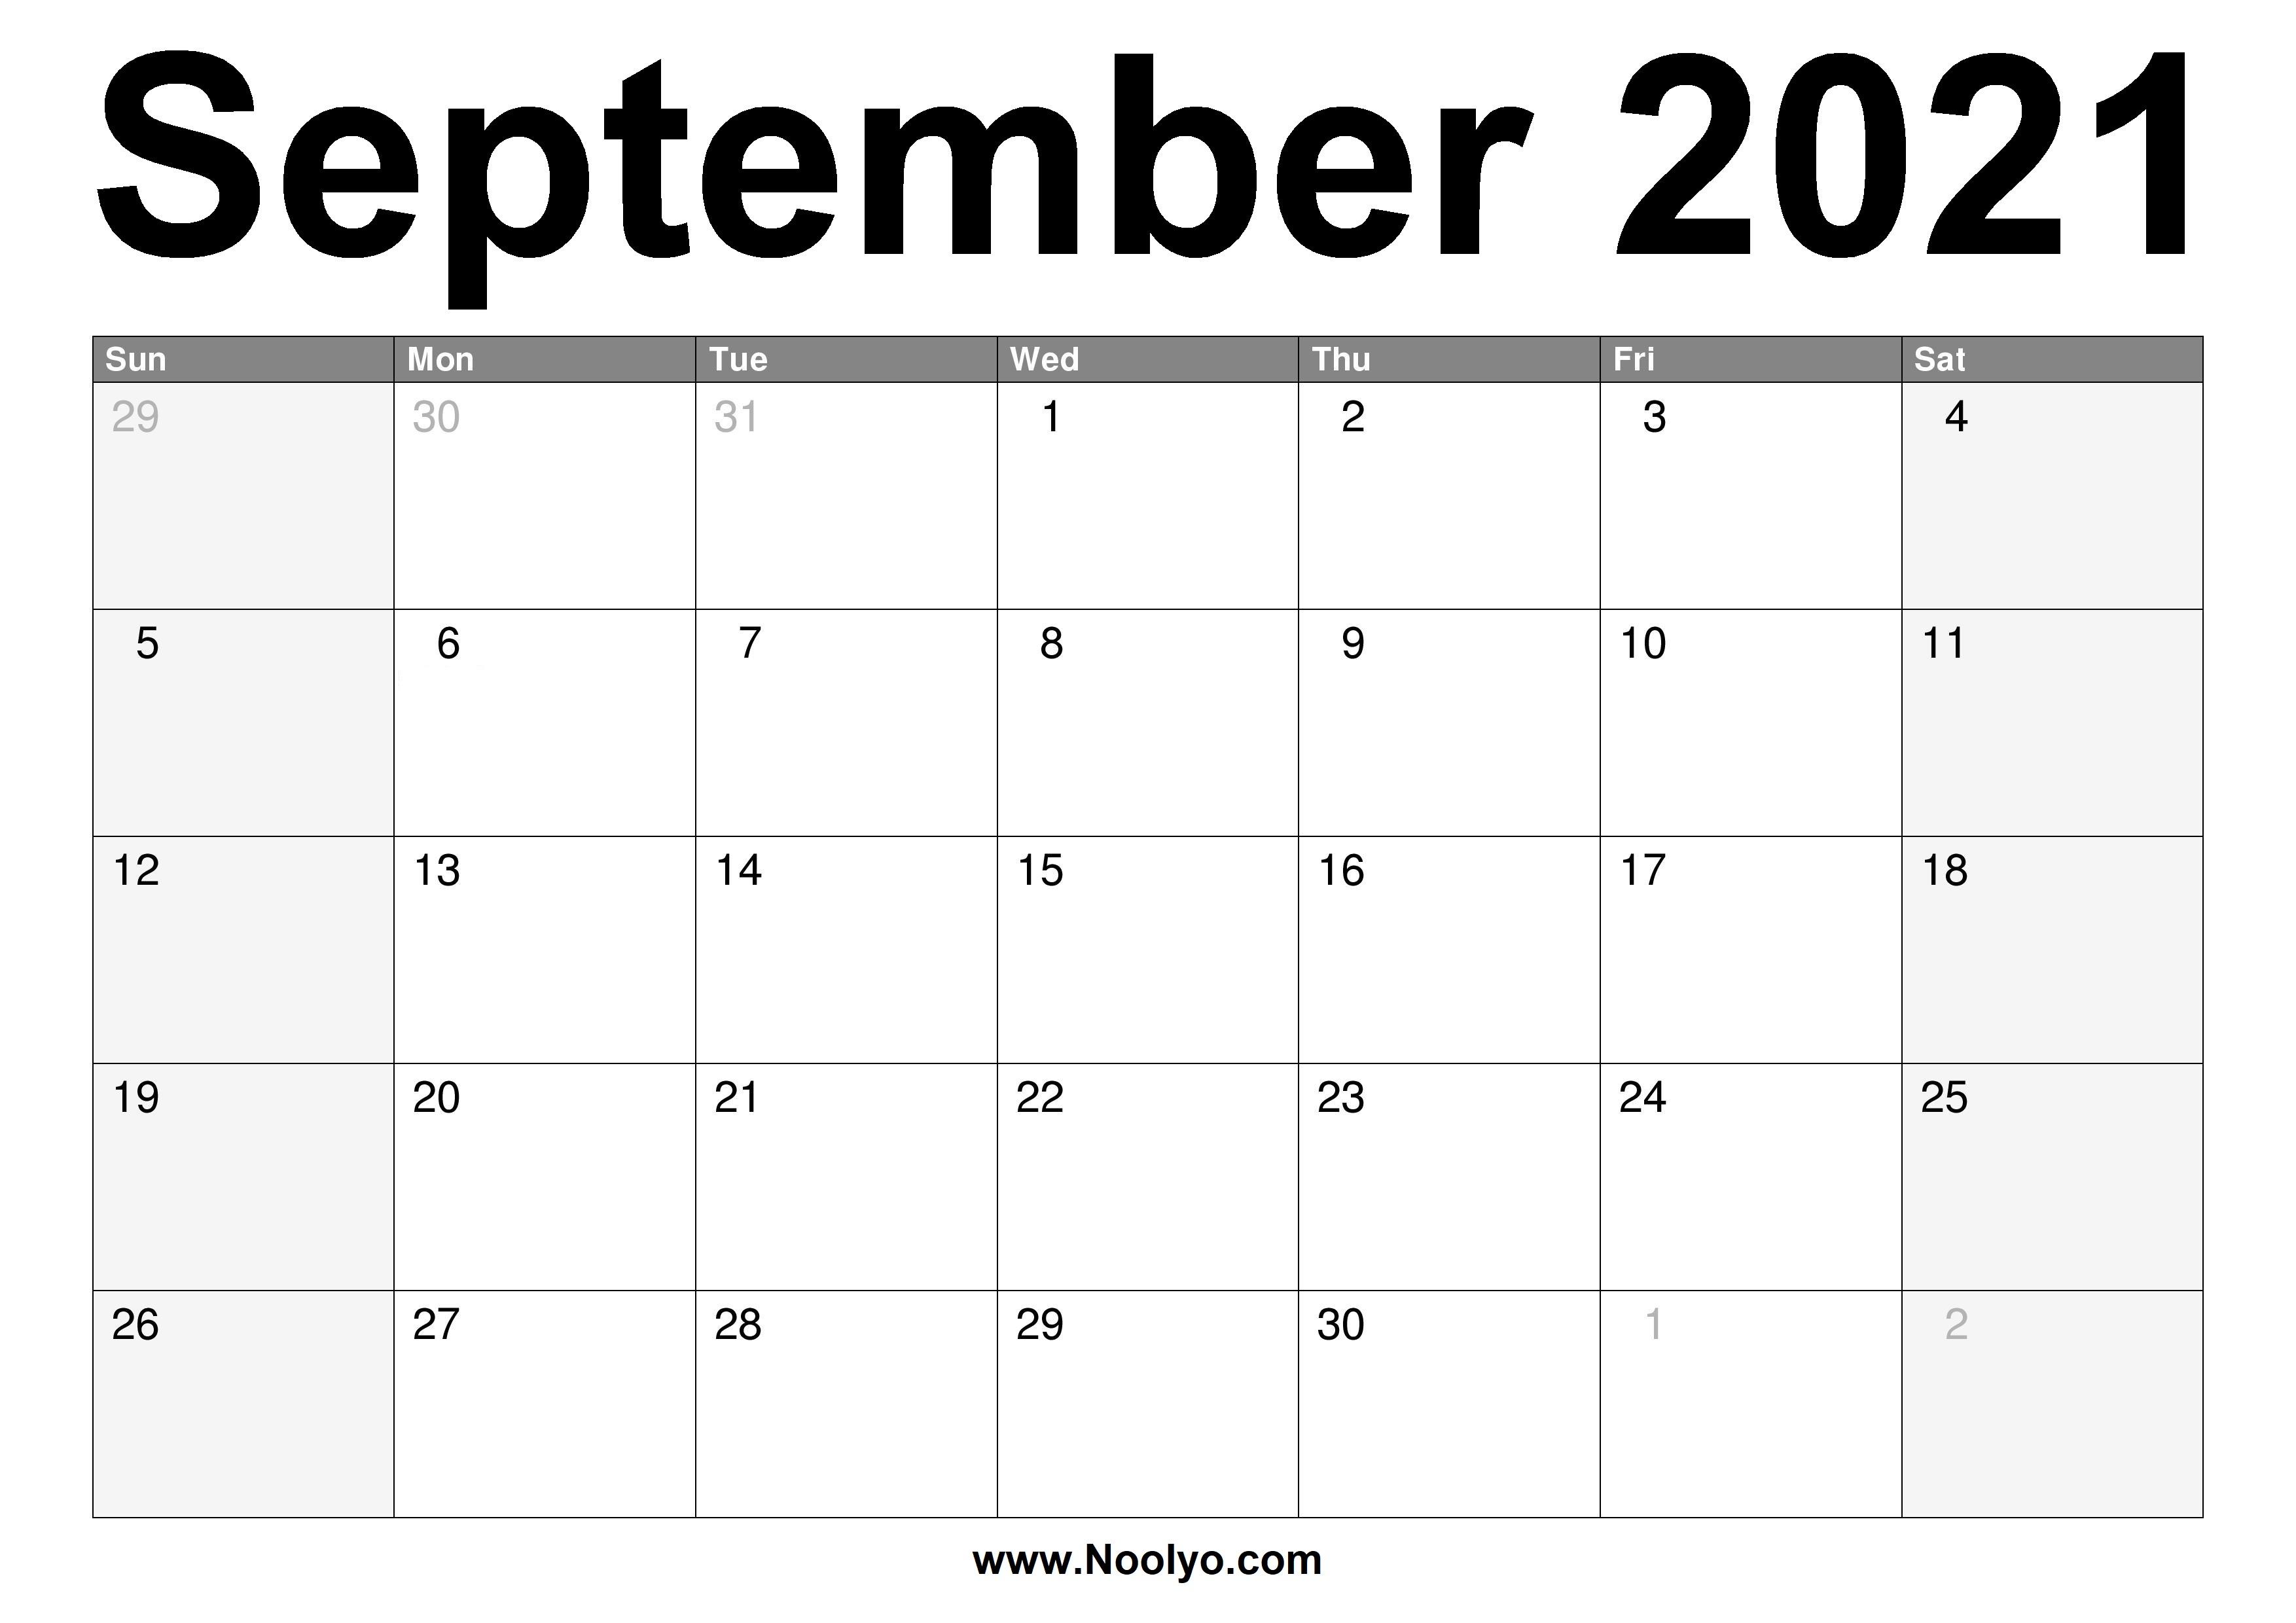 September 2021 Calendar Printable - Free Download - Noolyo.com